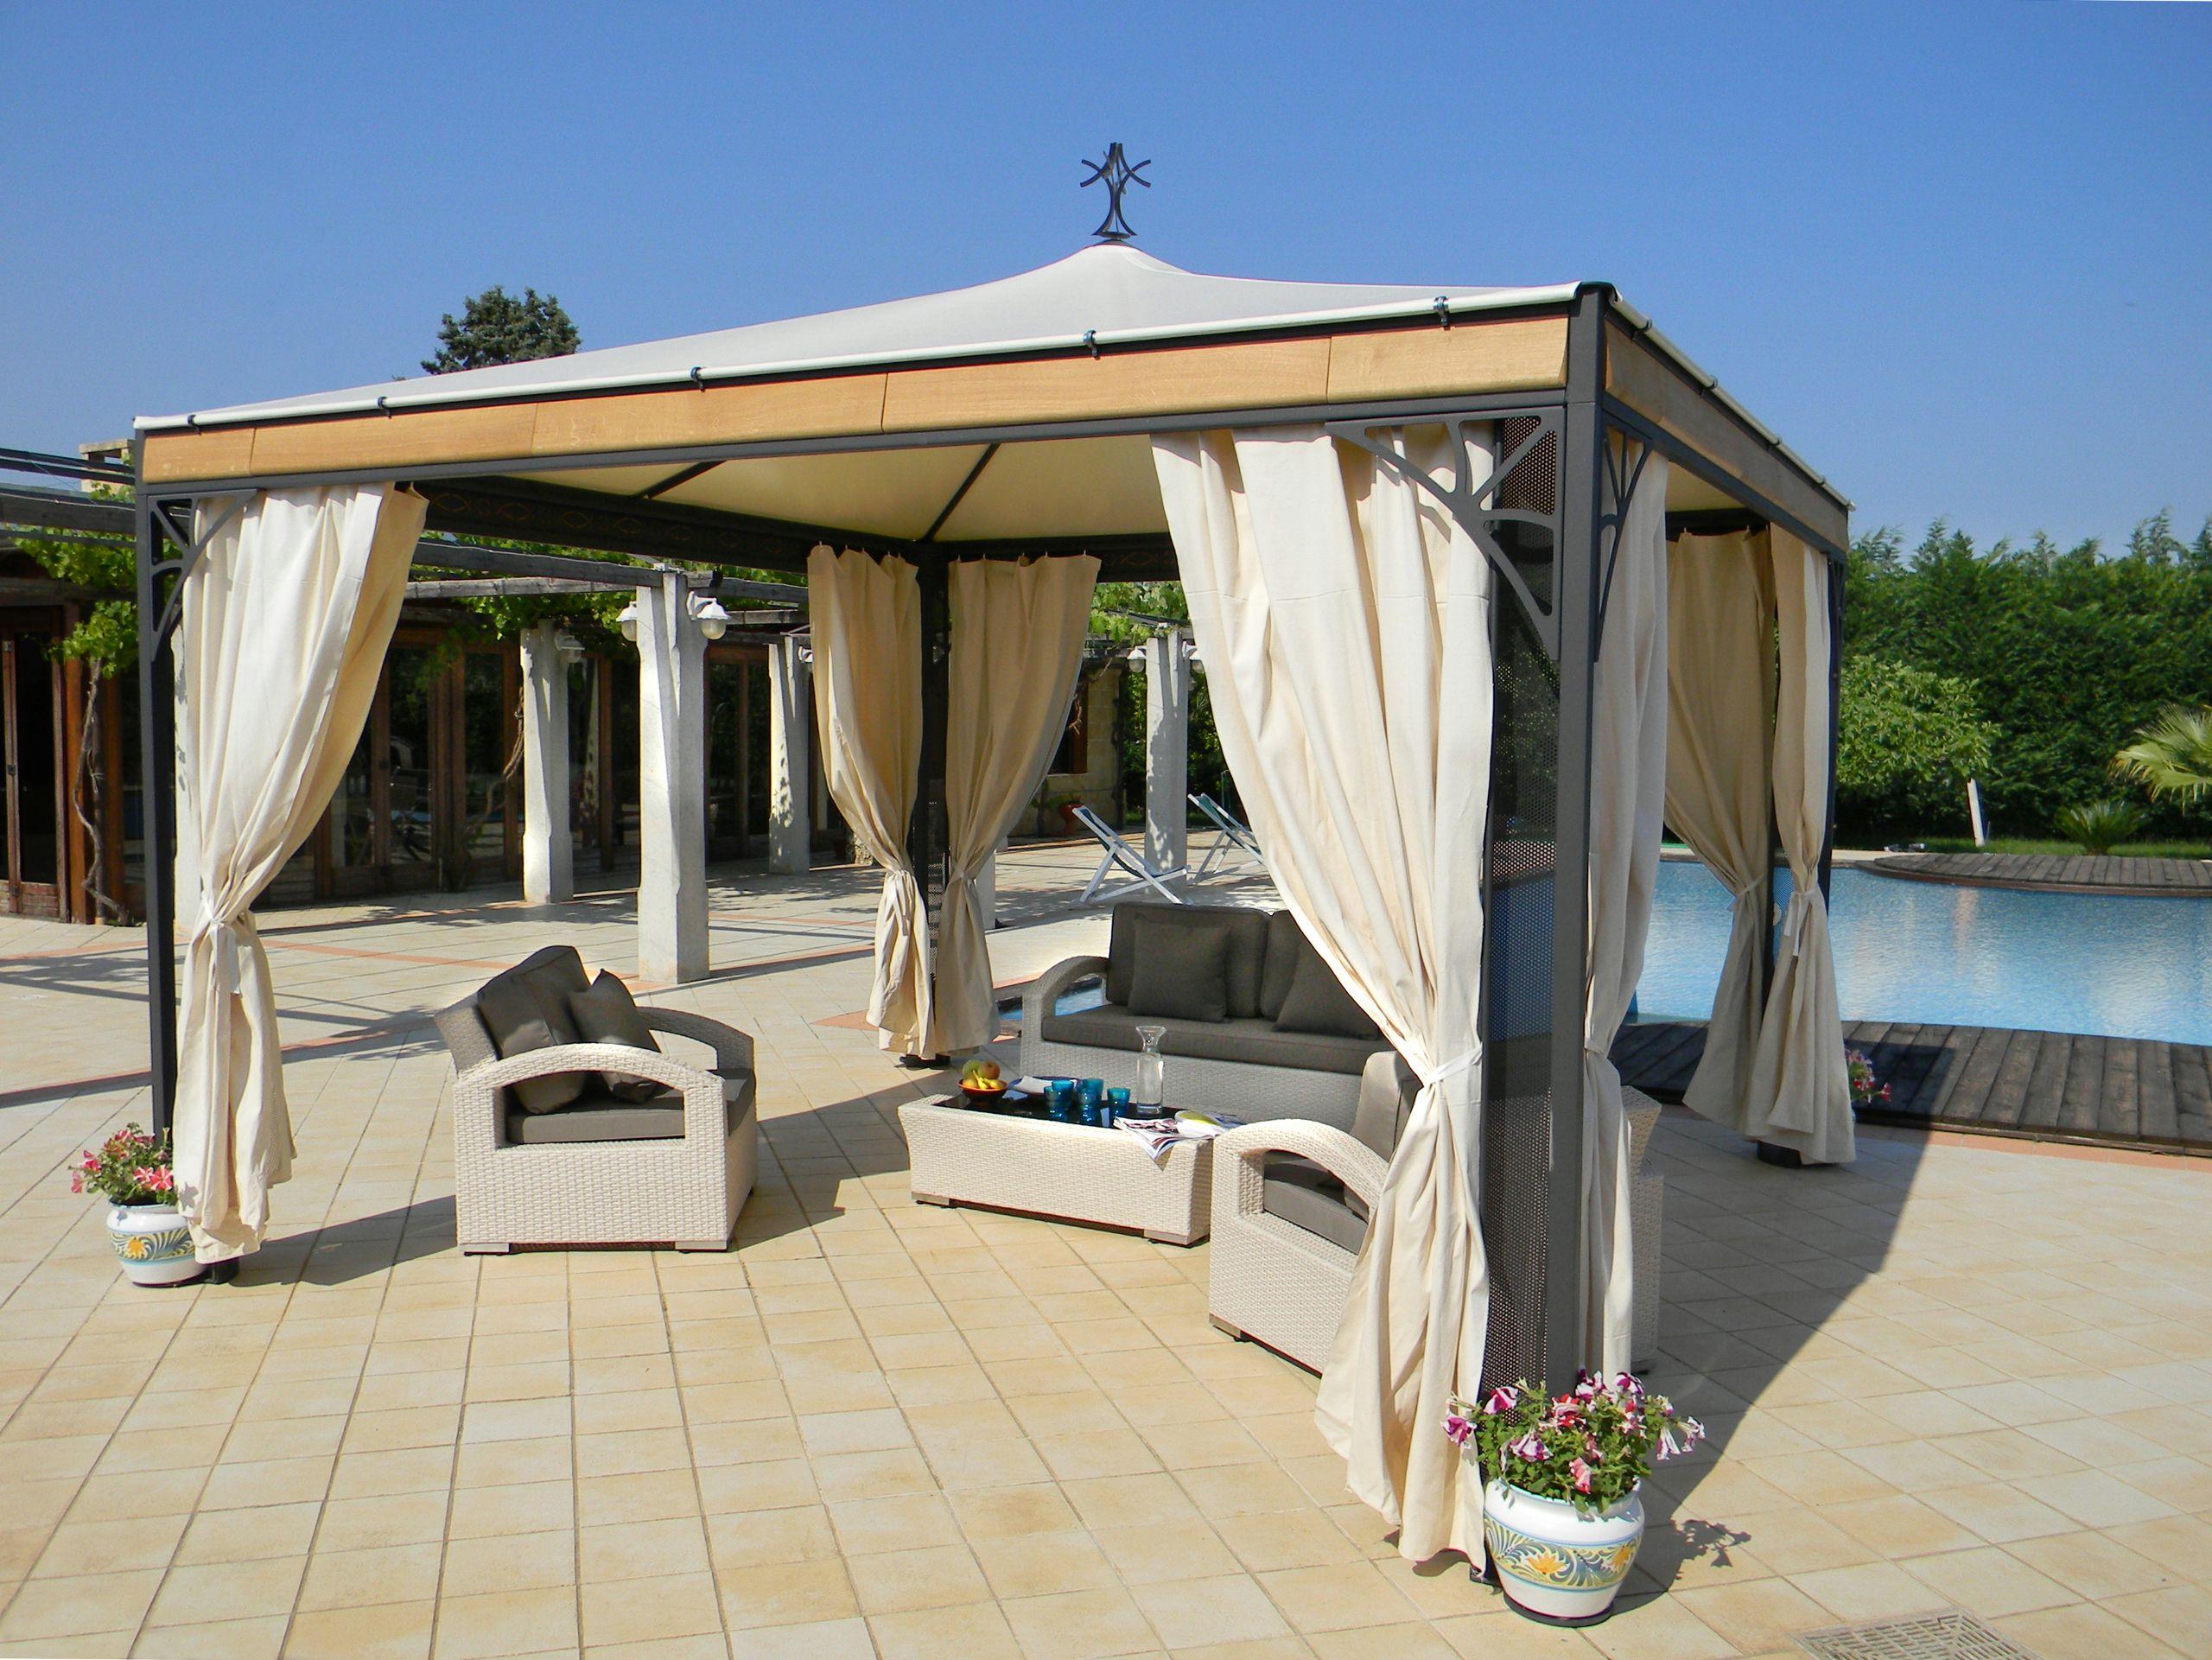 gartenpavillon aus stahl perla kollektion golden by sprech. Black Bedroom Furniture Sets. Home Design Ideas